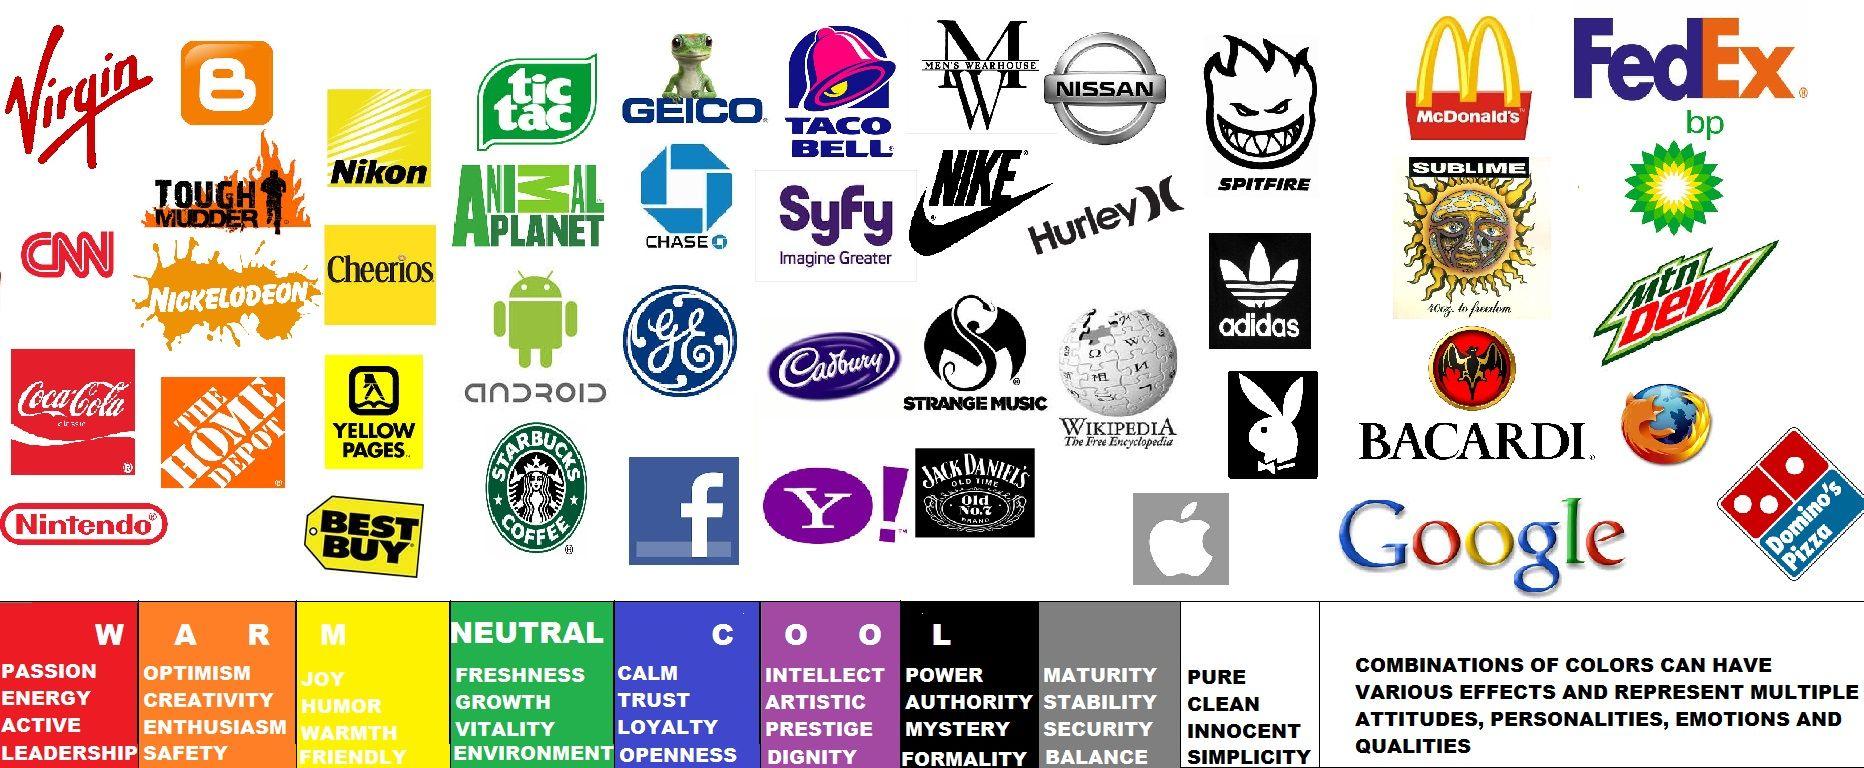 Color Matters Branding & Identity amazon Pesquisa